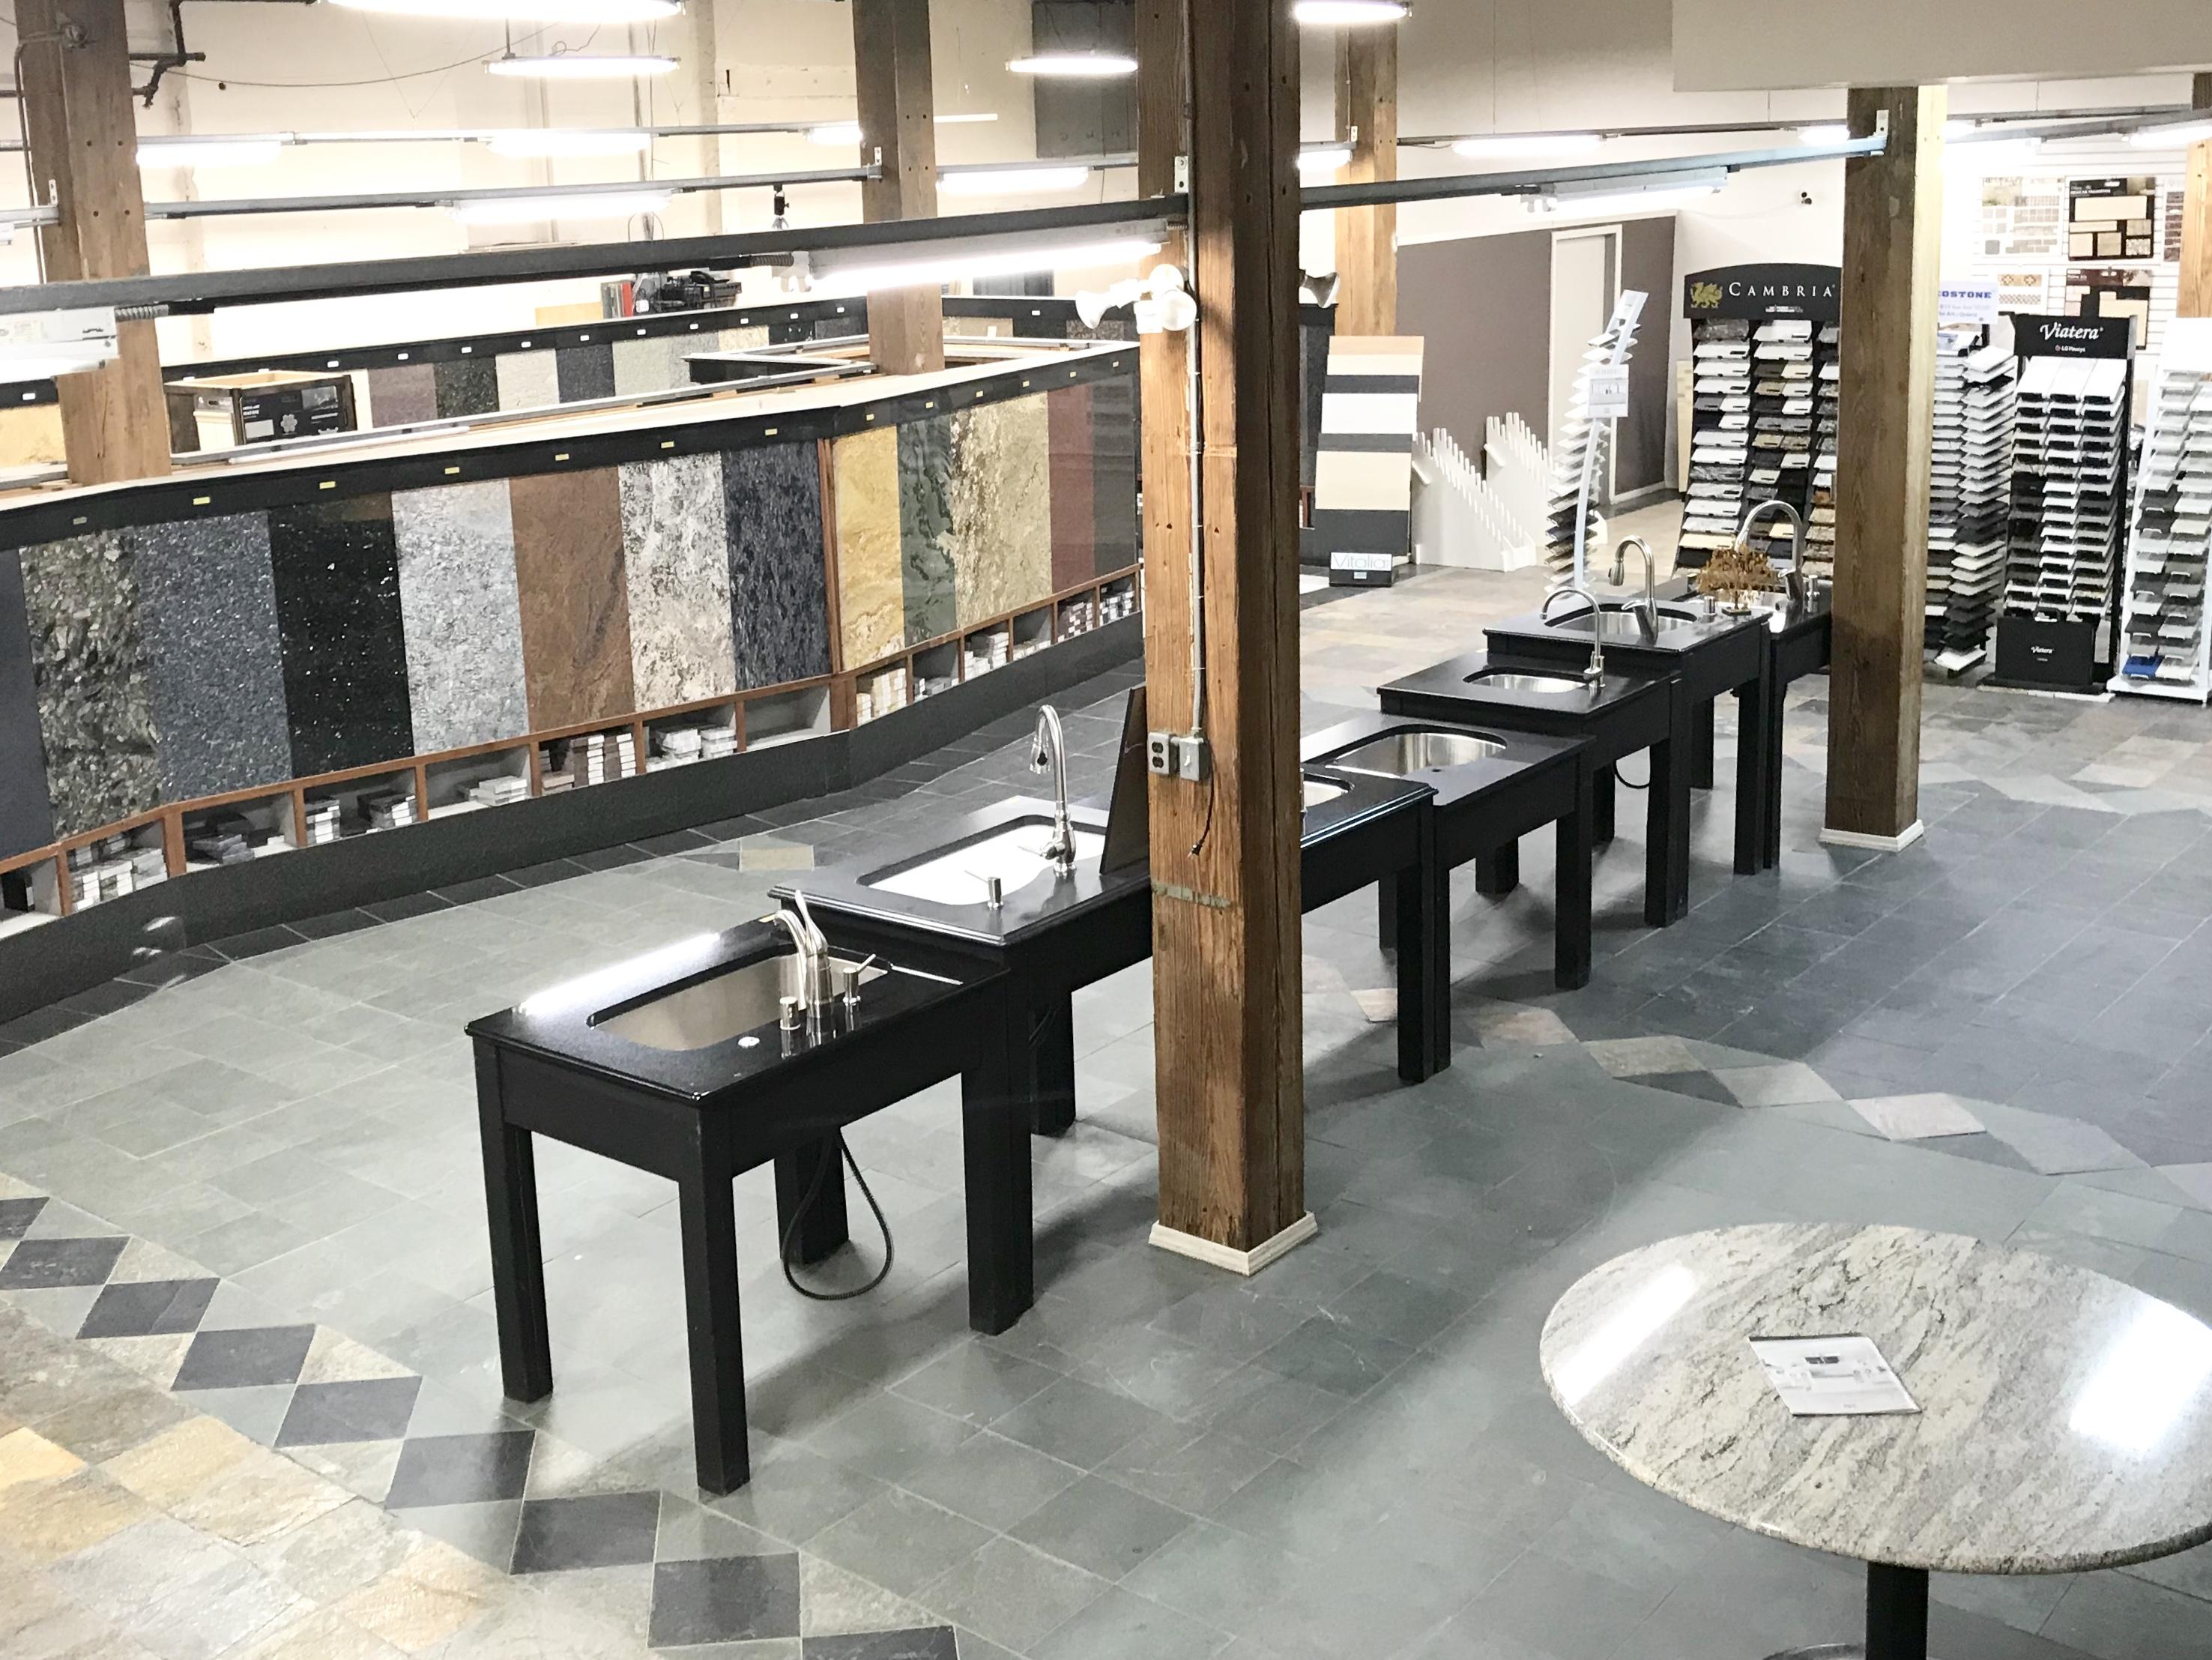 showroom counter milwaukee marble counters granite countertop wisconsin mg cat countertops mart fabricated kitchen limestone